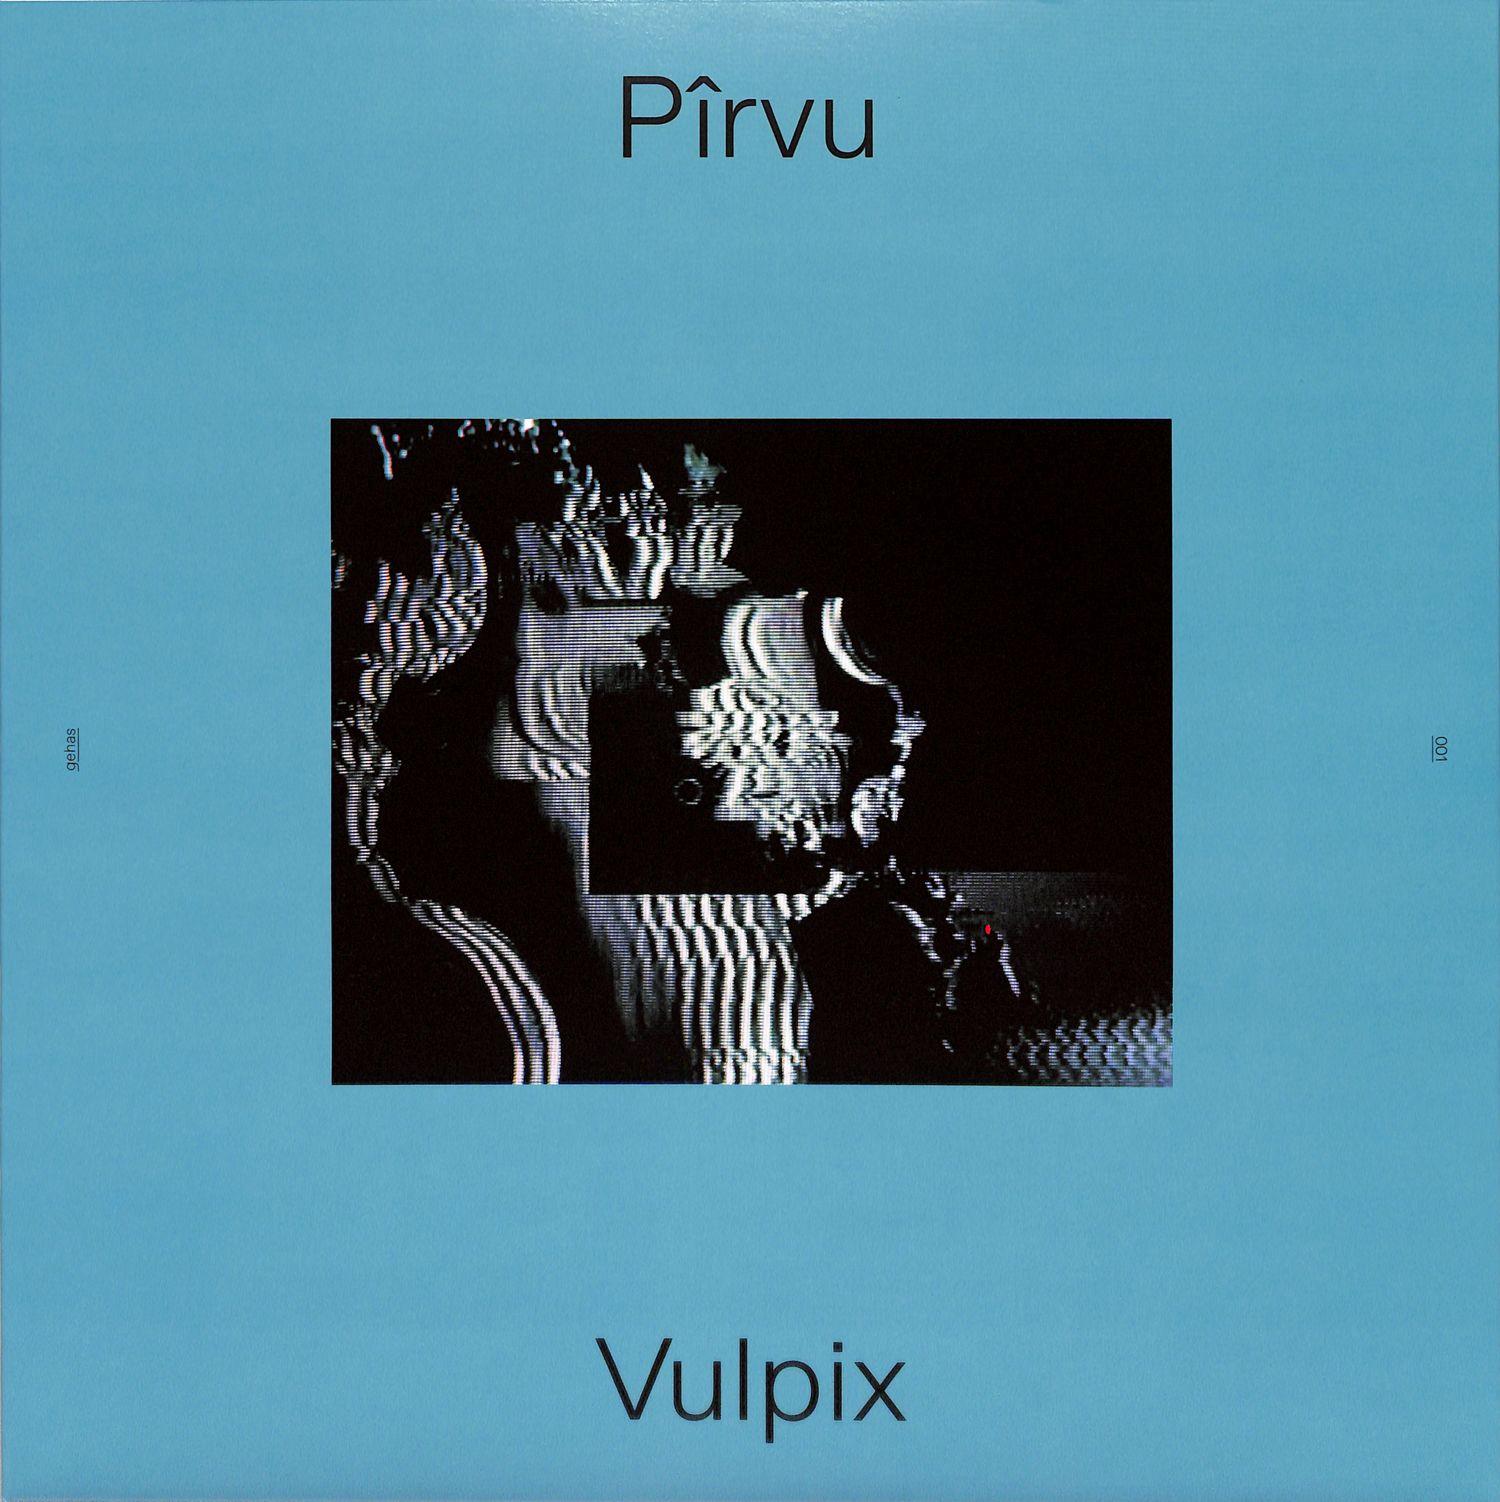 Pirvu - VULPIX EP